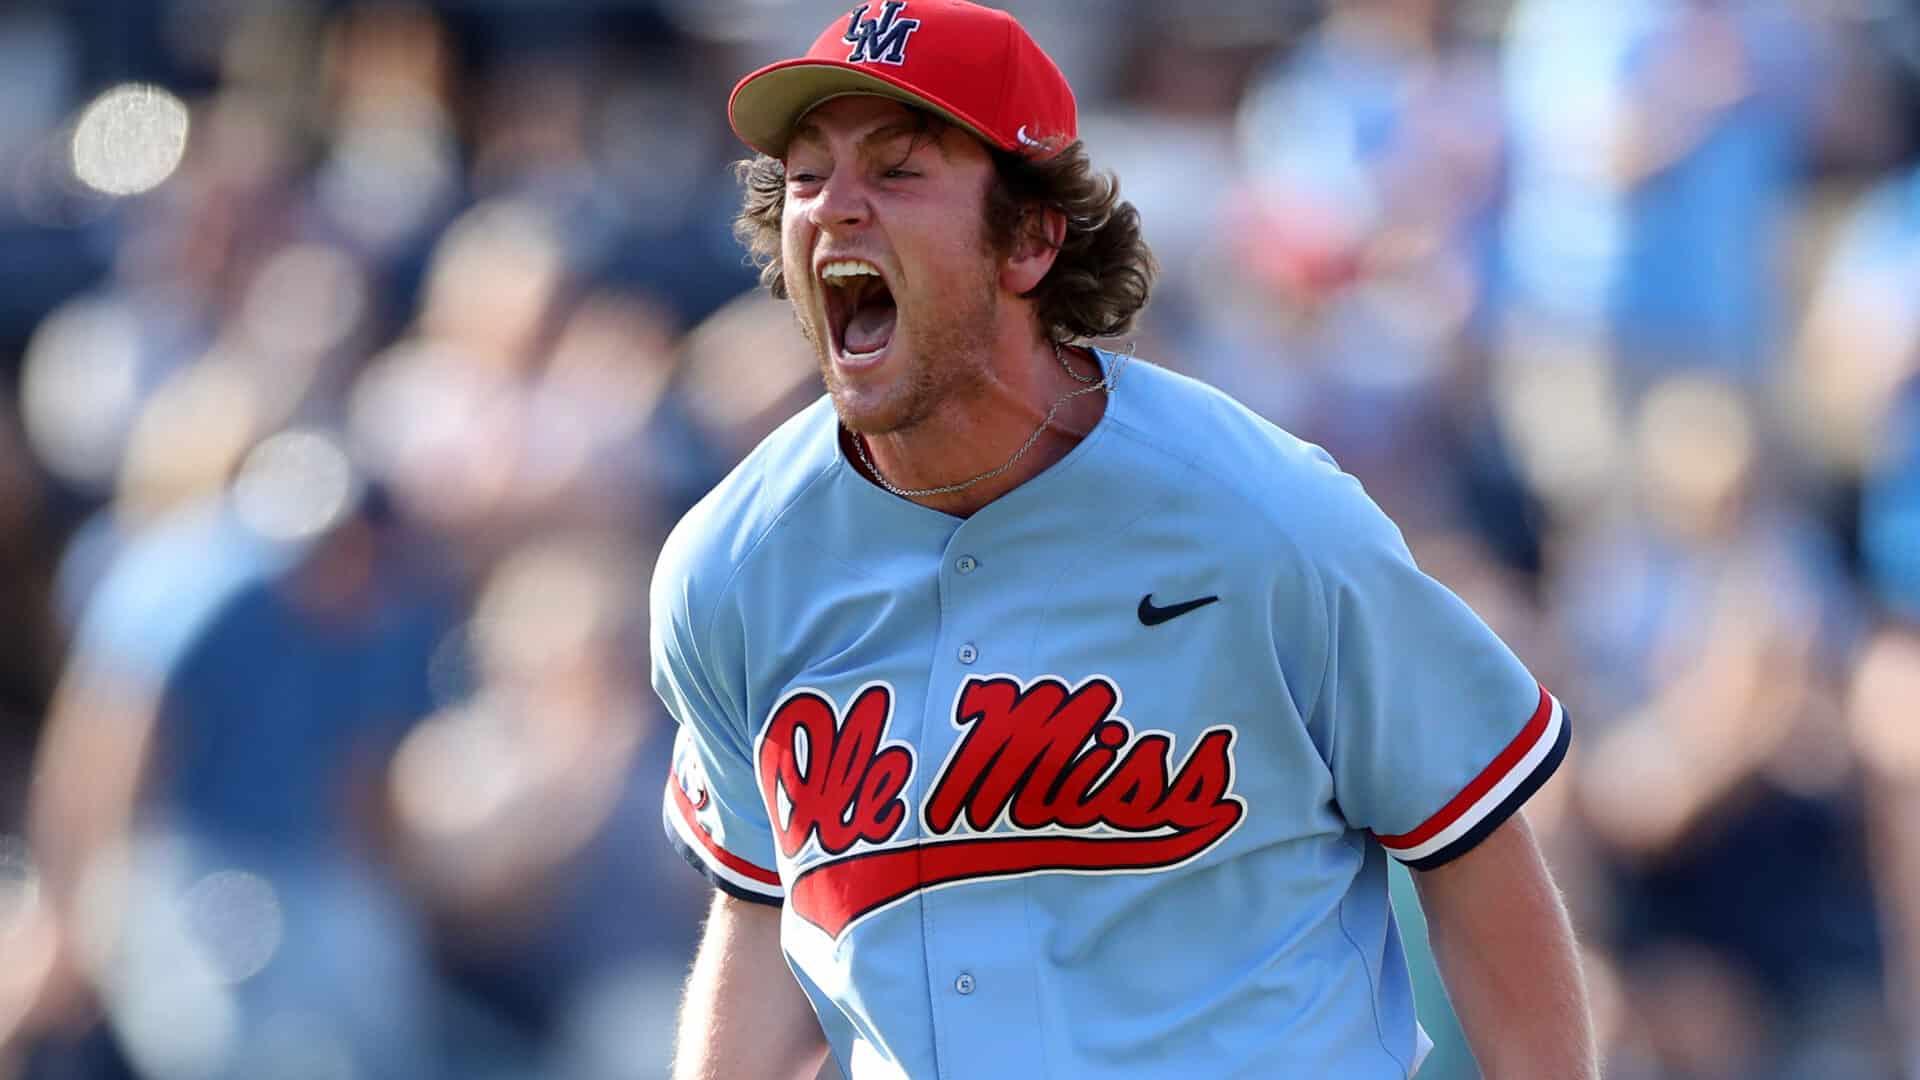 The Season: Ole Miss Baseball - Relentless (2021)